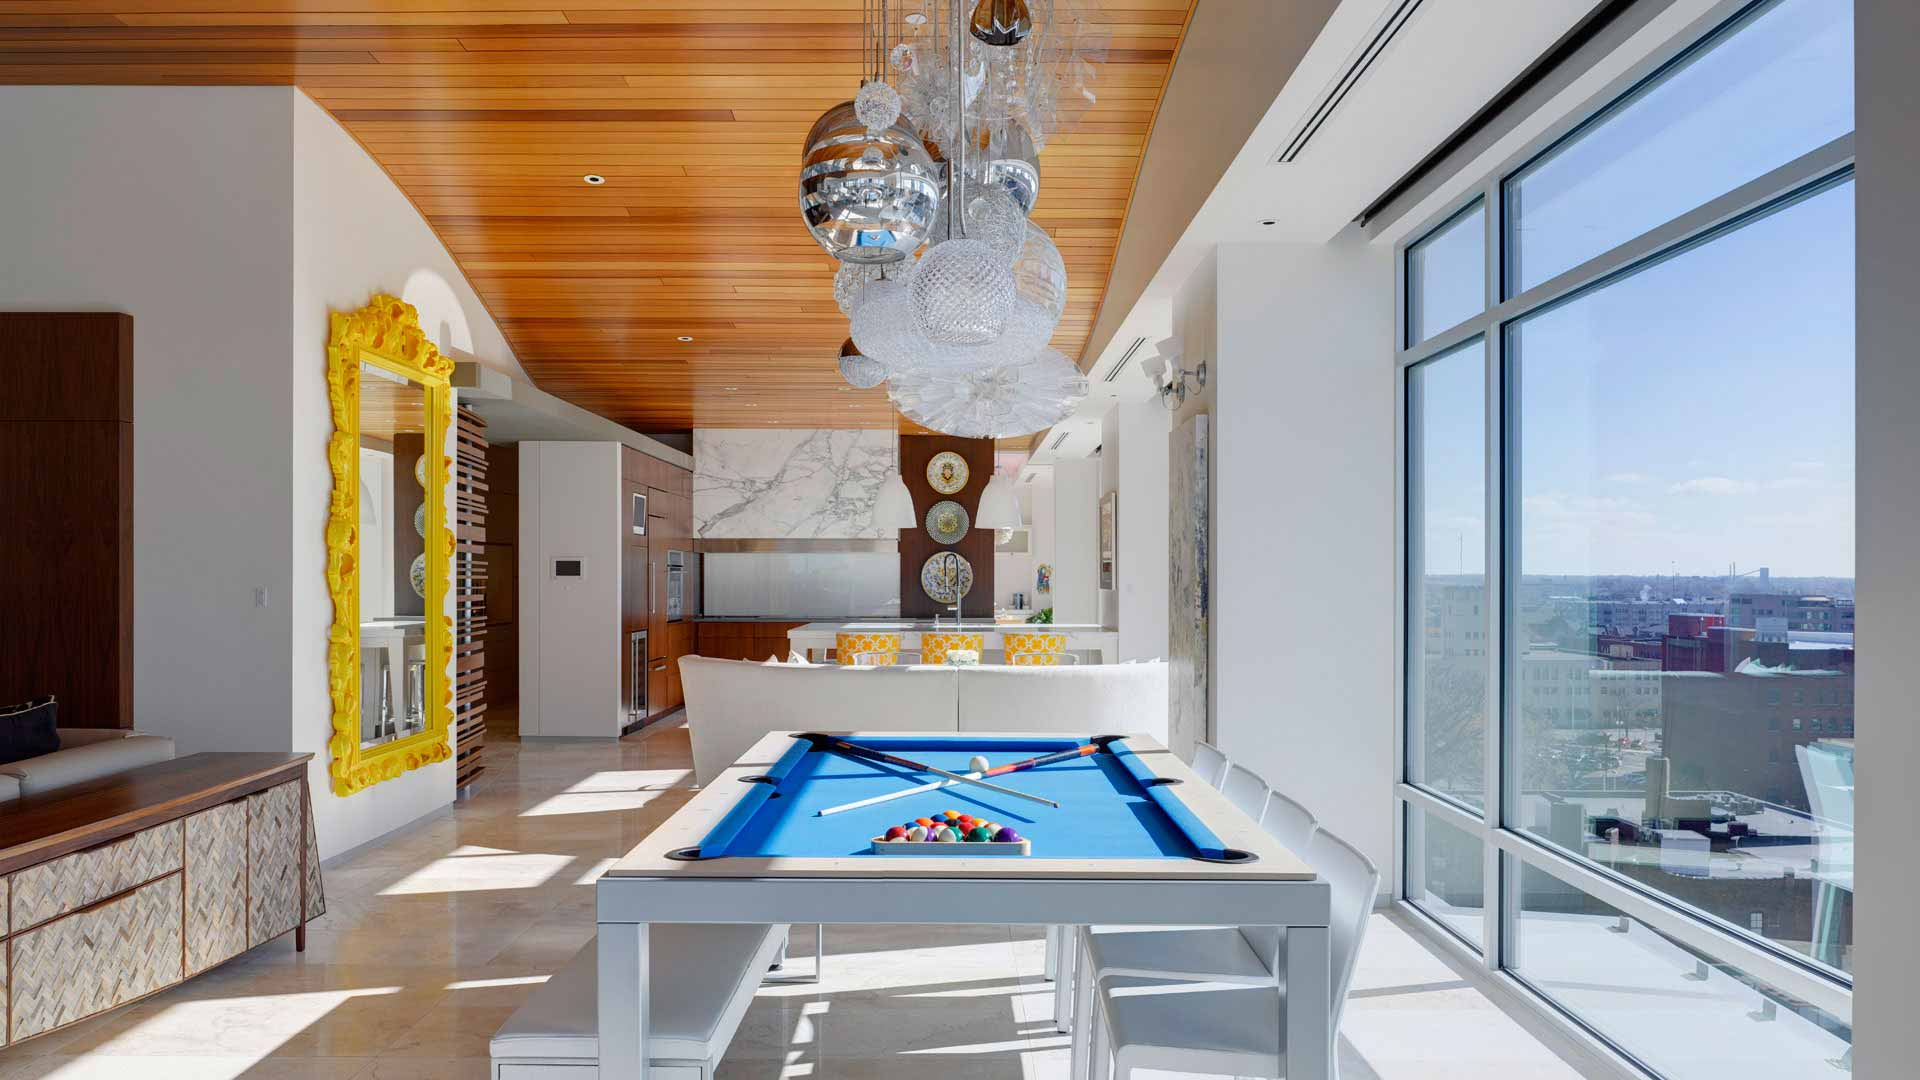 Adagio Penthouse Interior - Open Concept Dining - HAUS Architecture, Christopher Short, Indianapolis Architect